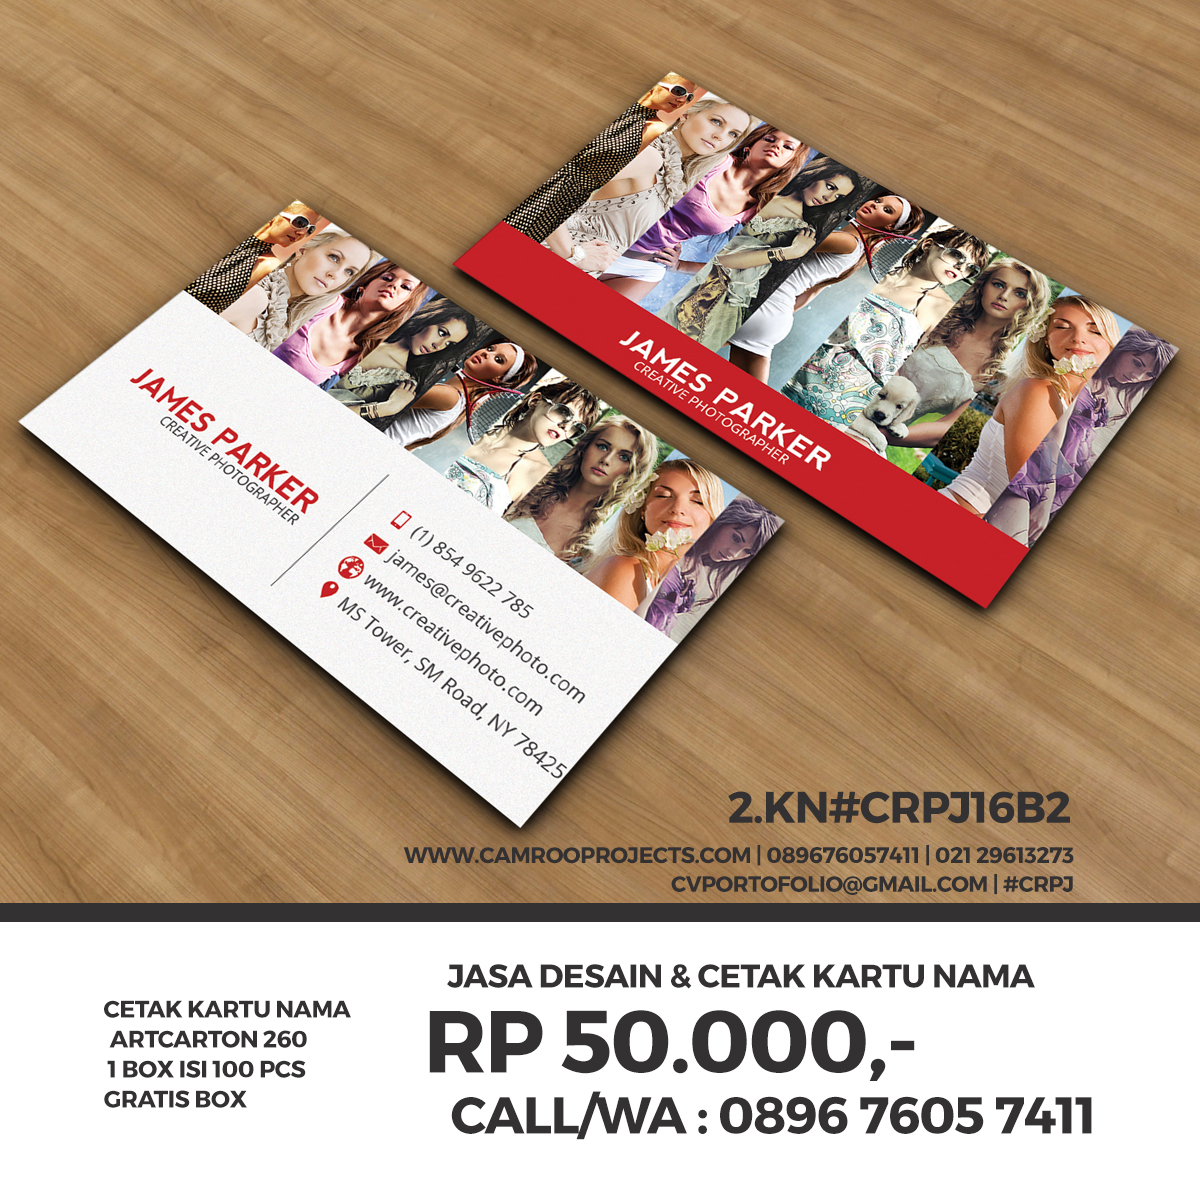 Jasa Buat Kartu Nama Minimalis Di Jakarta